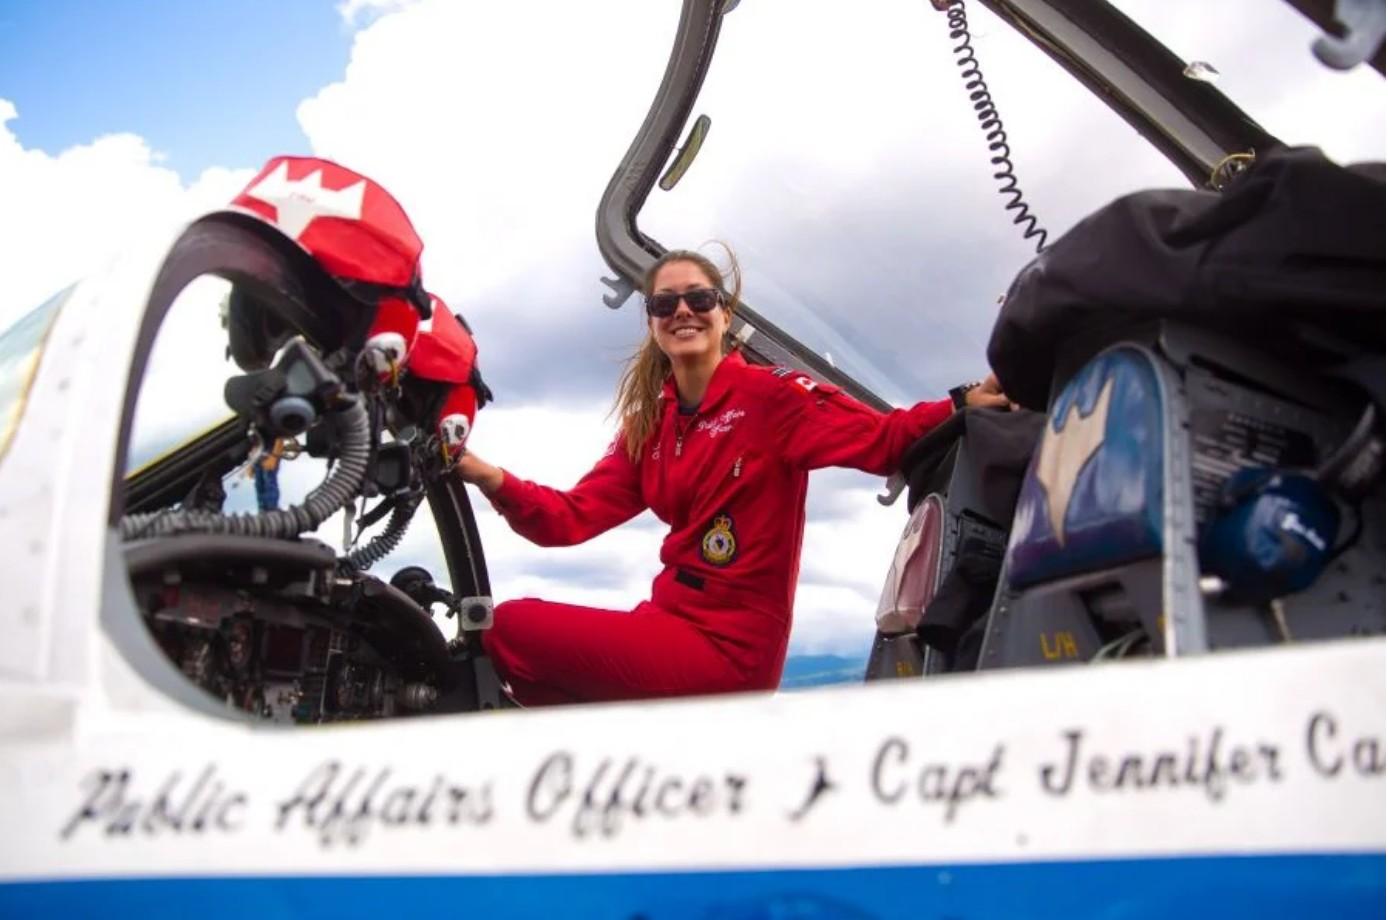 OPERATION INSPIRATION: SNOWBIRD DOING HER JOB